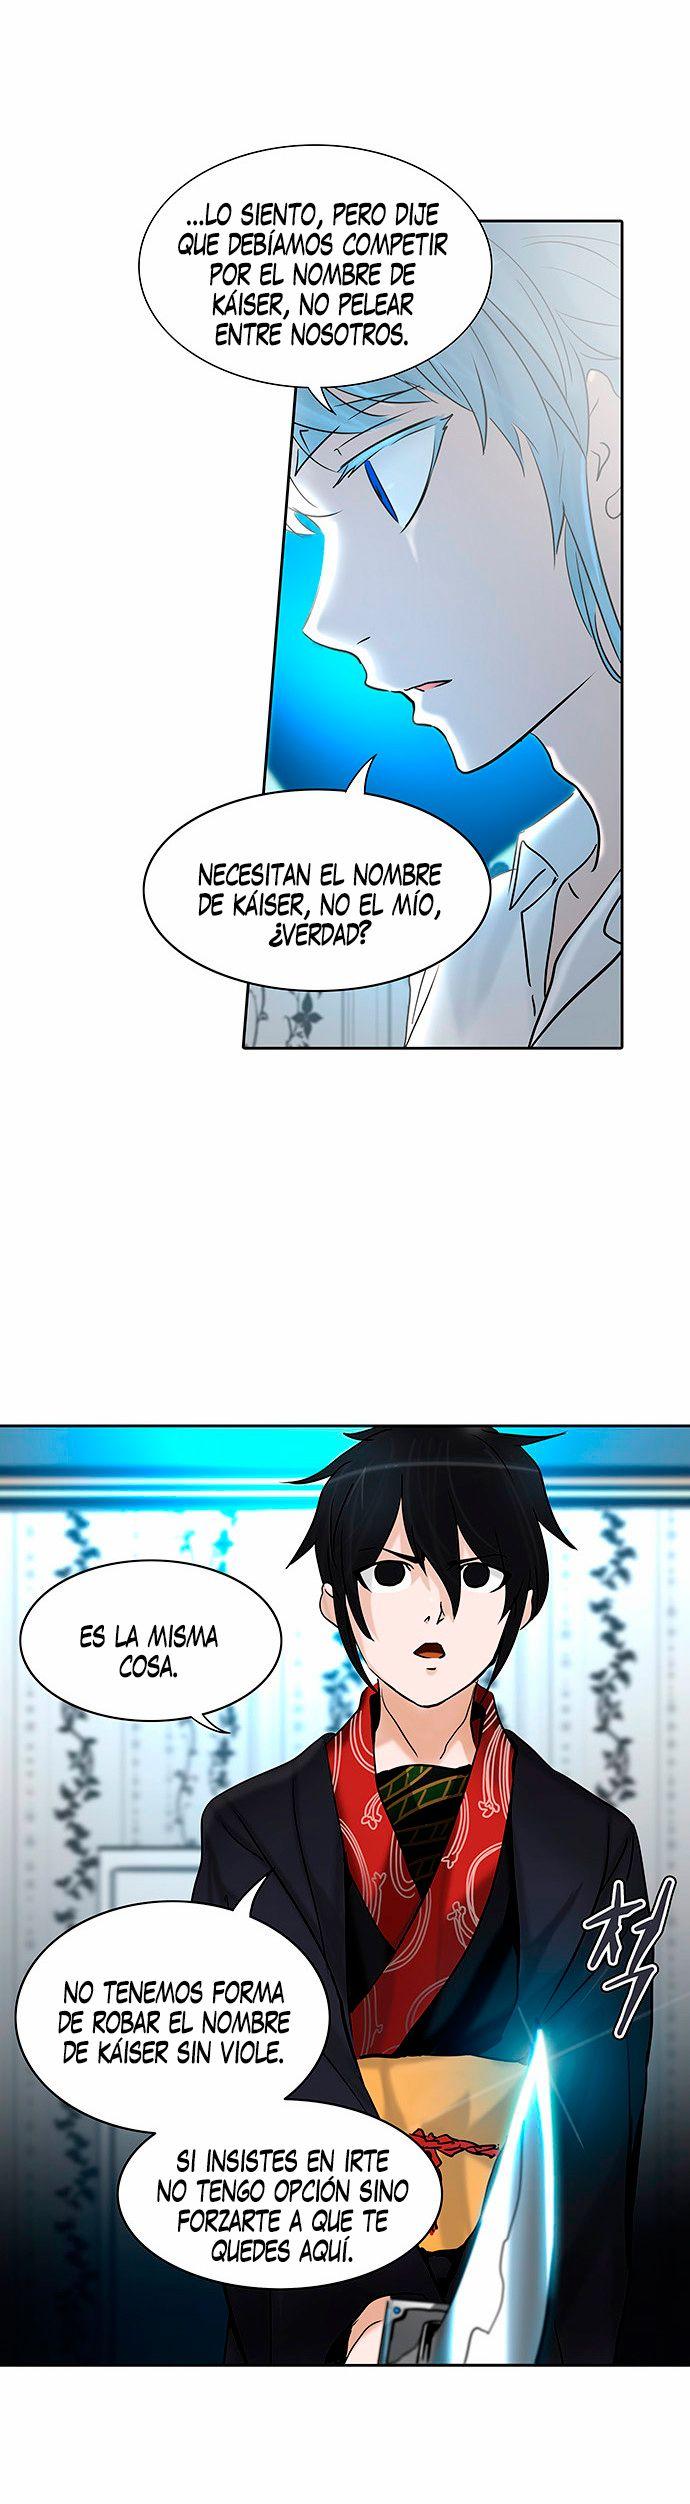 http://c5.ninemanga.com/es_manga/21/149/482912/c3486b1e7edde8c61dce883771470fed.jpg Page 9